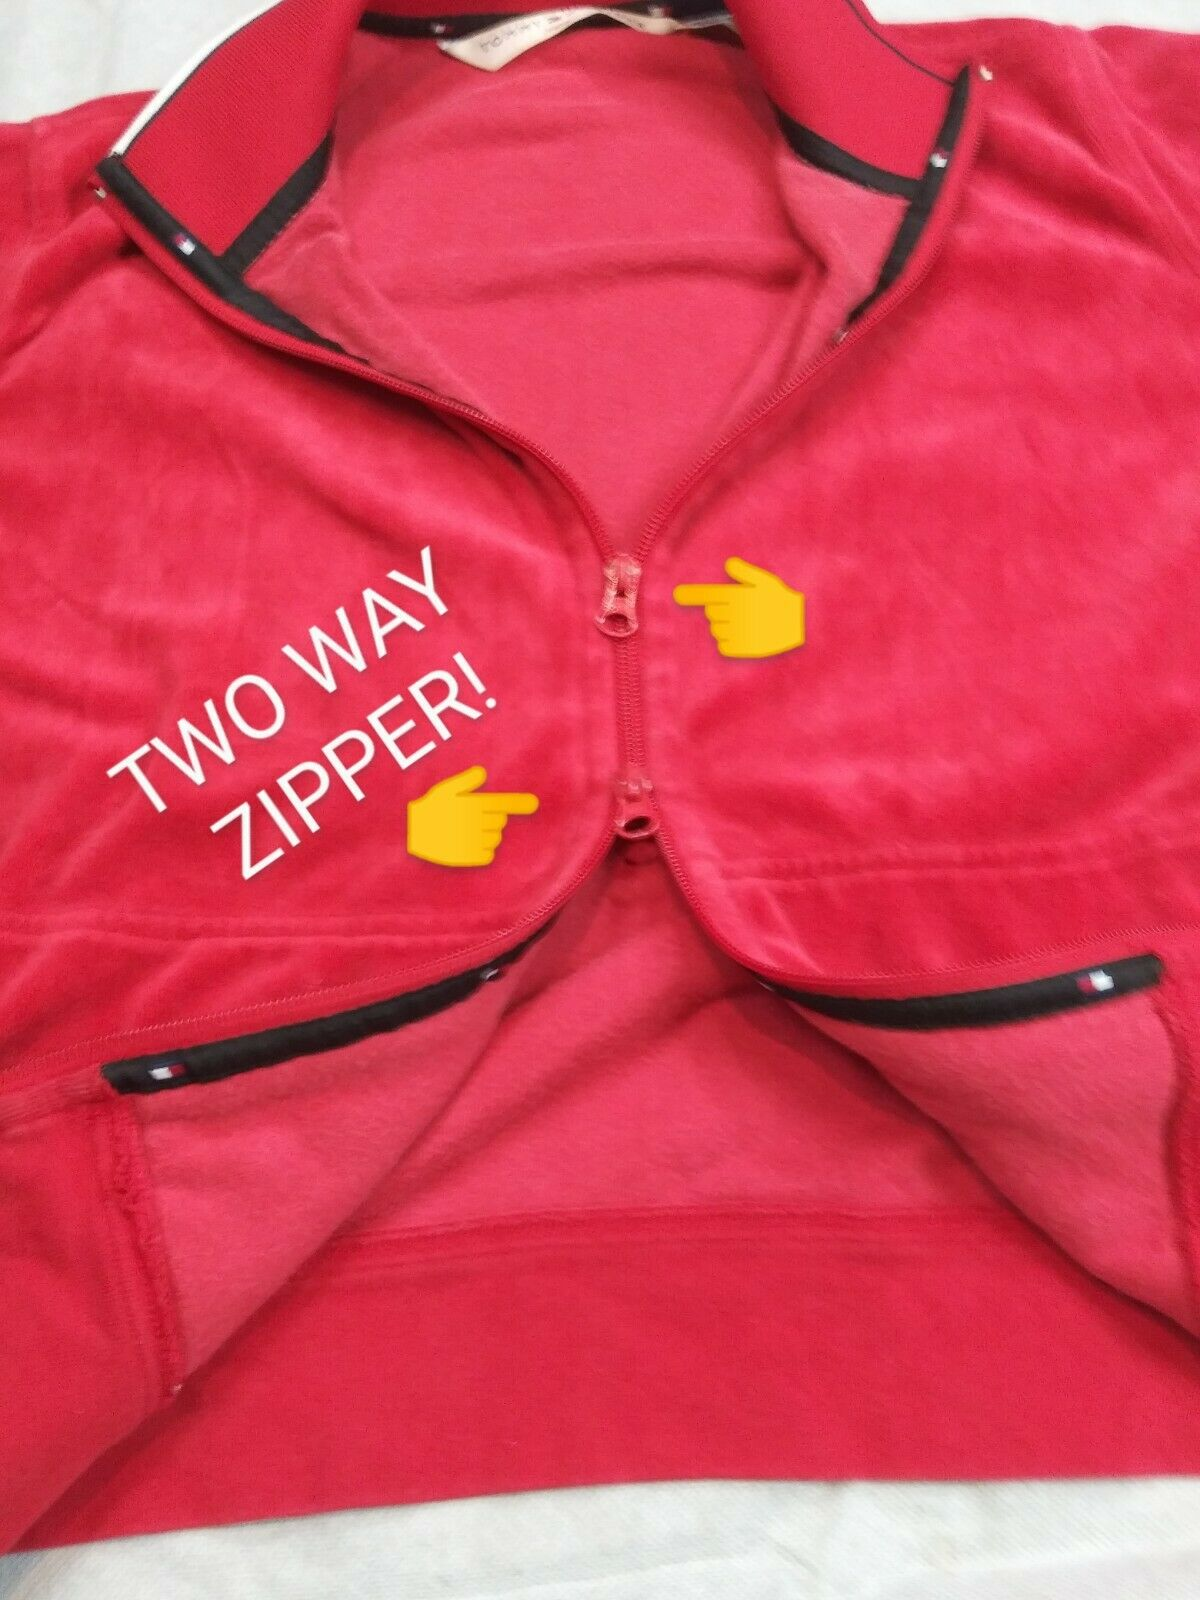 Vintage Tommy Hilfiger Red Velour track jacket 2 way zipper XL 90s 2000s